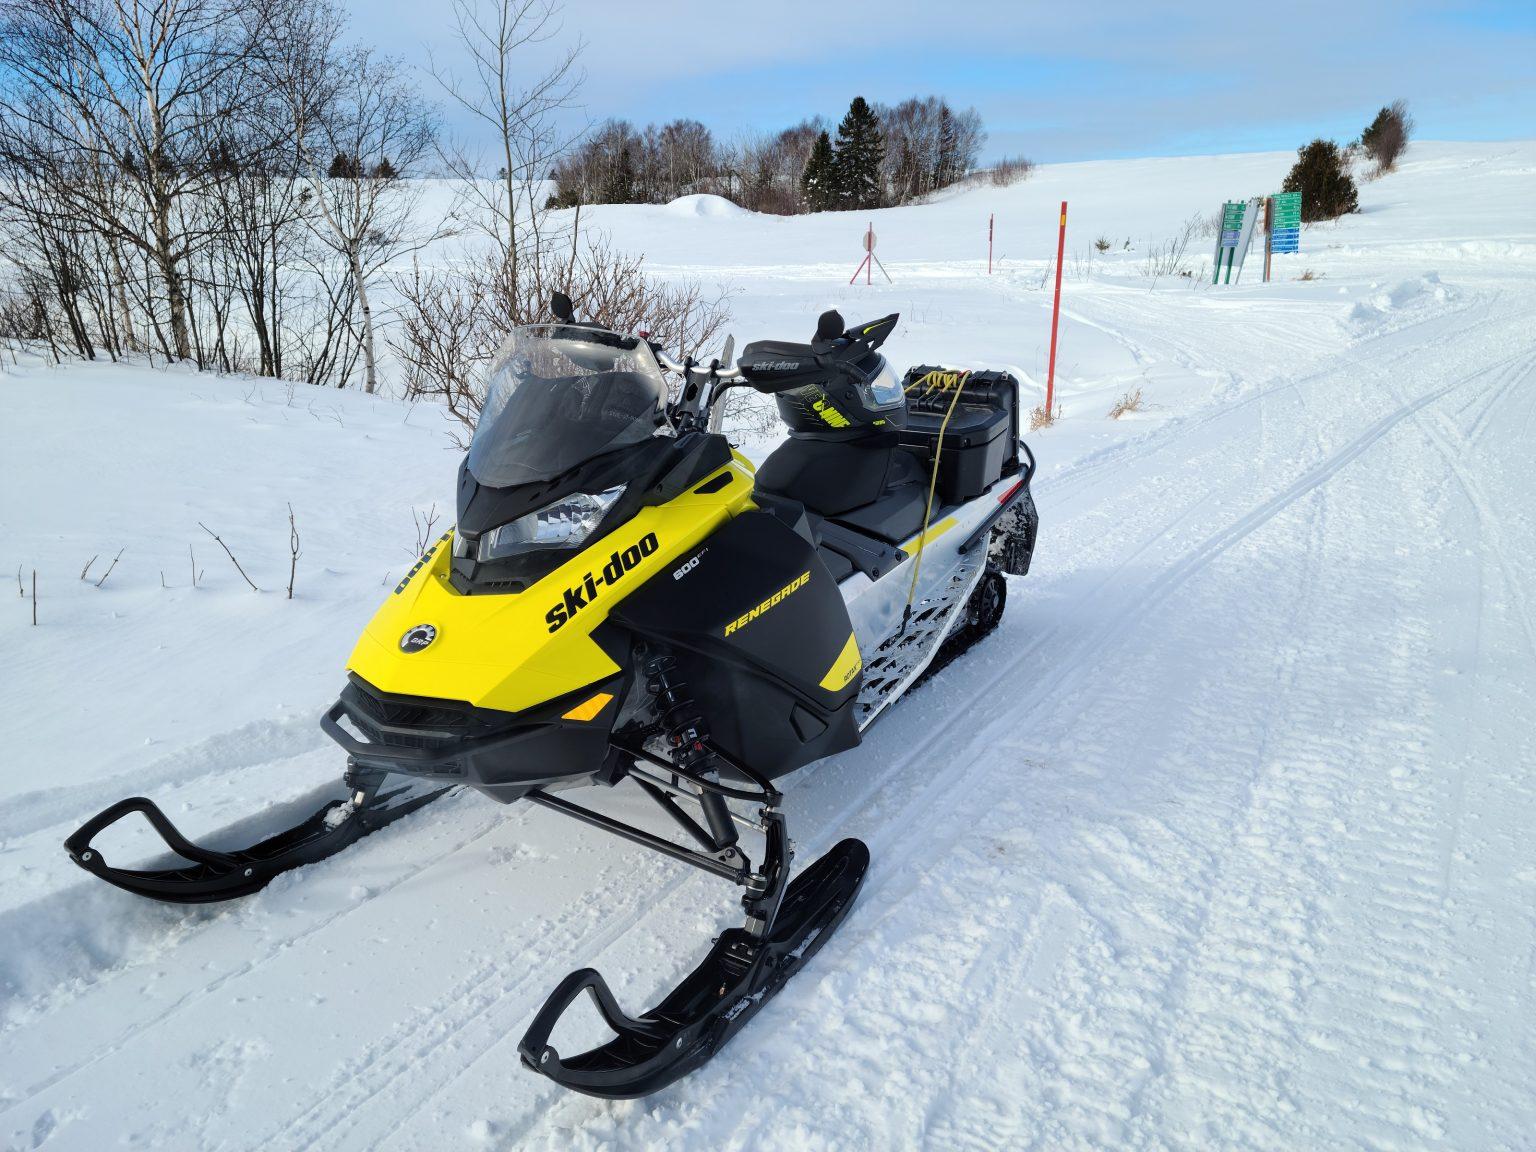 Ski-Doo Renegade Sports 600 EFI 2022